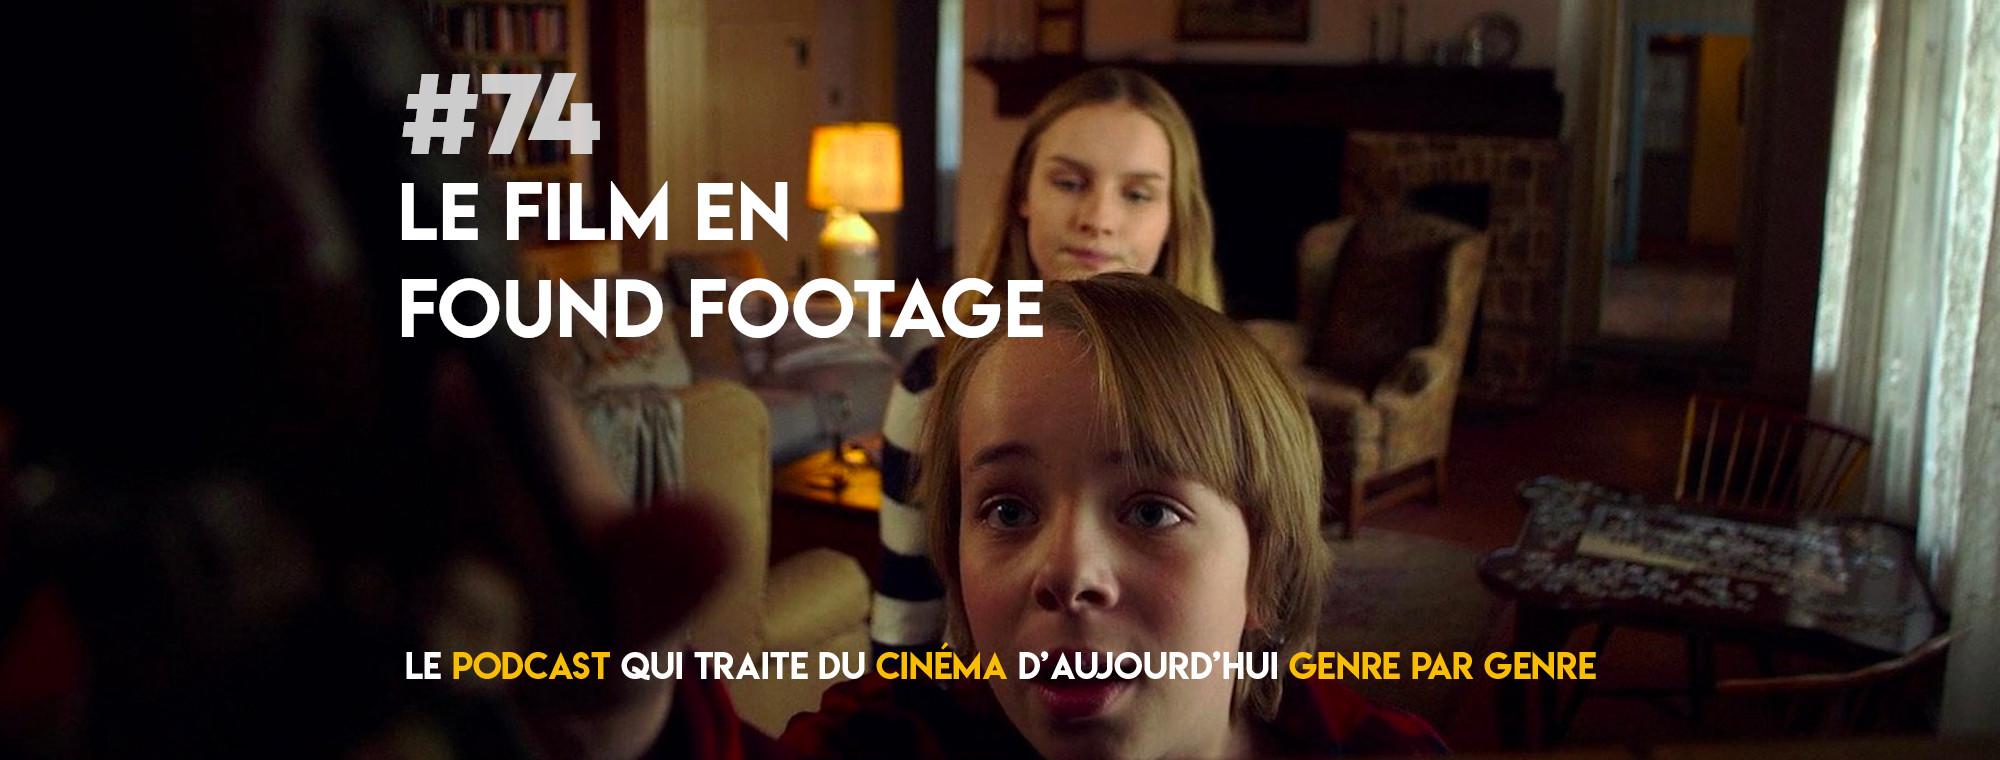 Parlons Péloches - #74 Le film en found footage